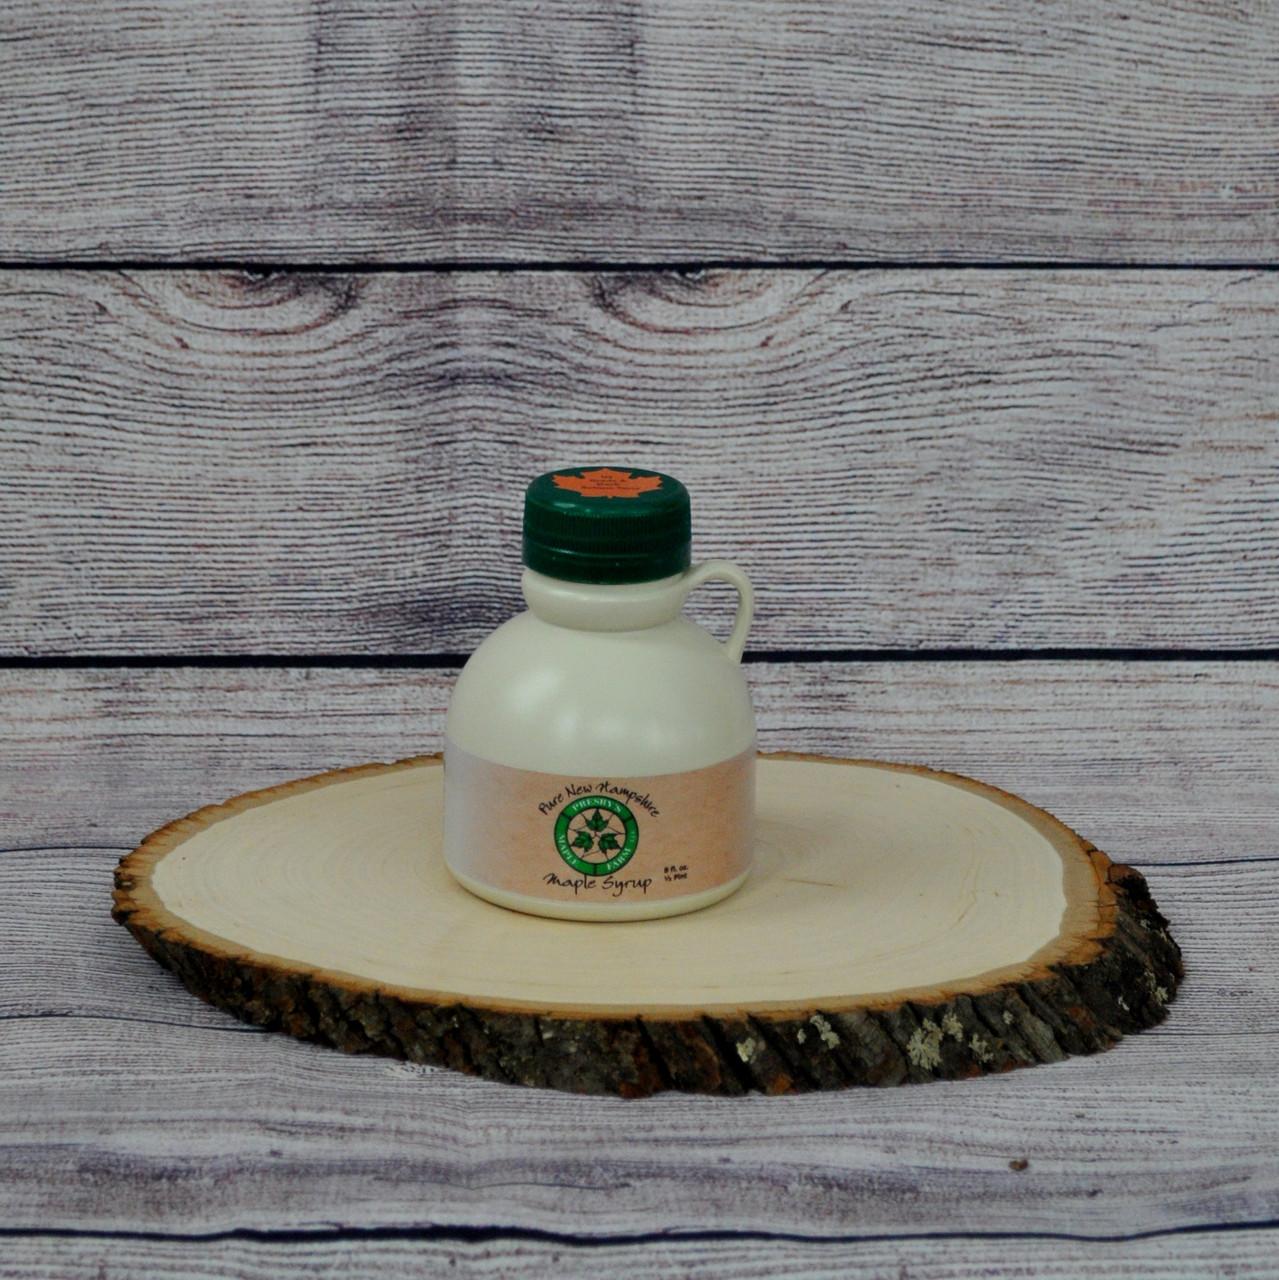 1/2 pint of Presby's Maple Farm LLC maple syrup